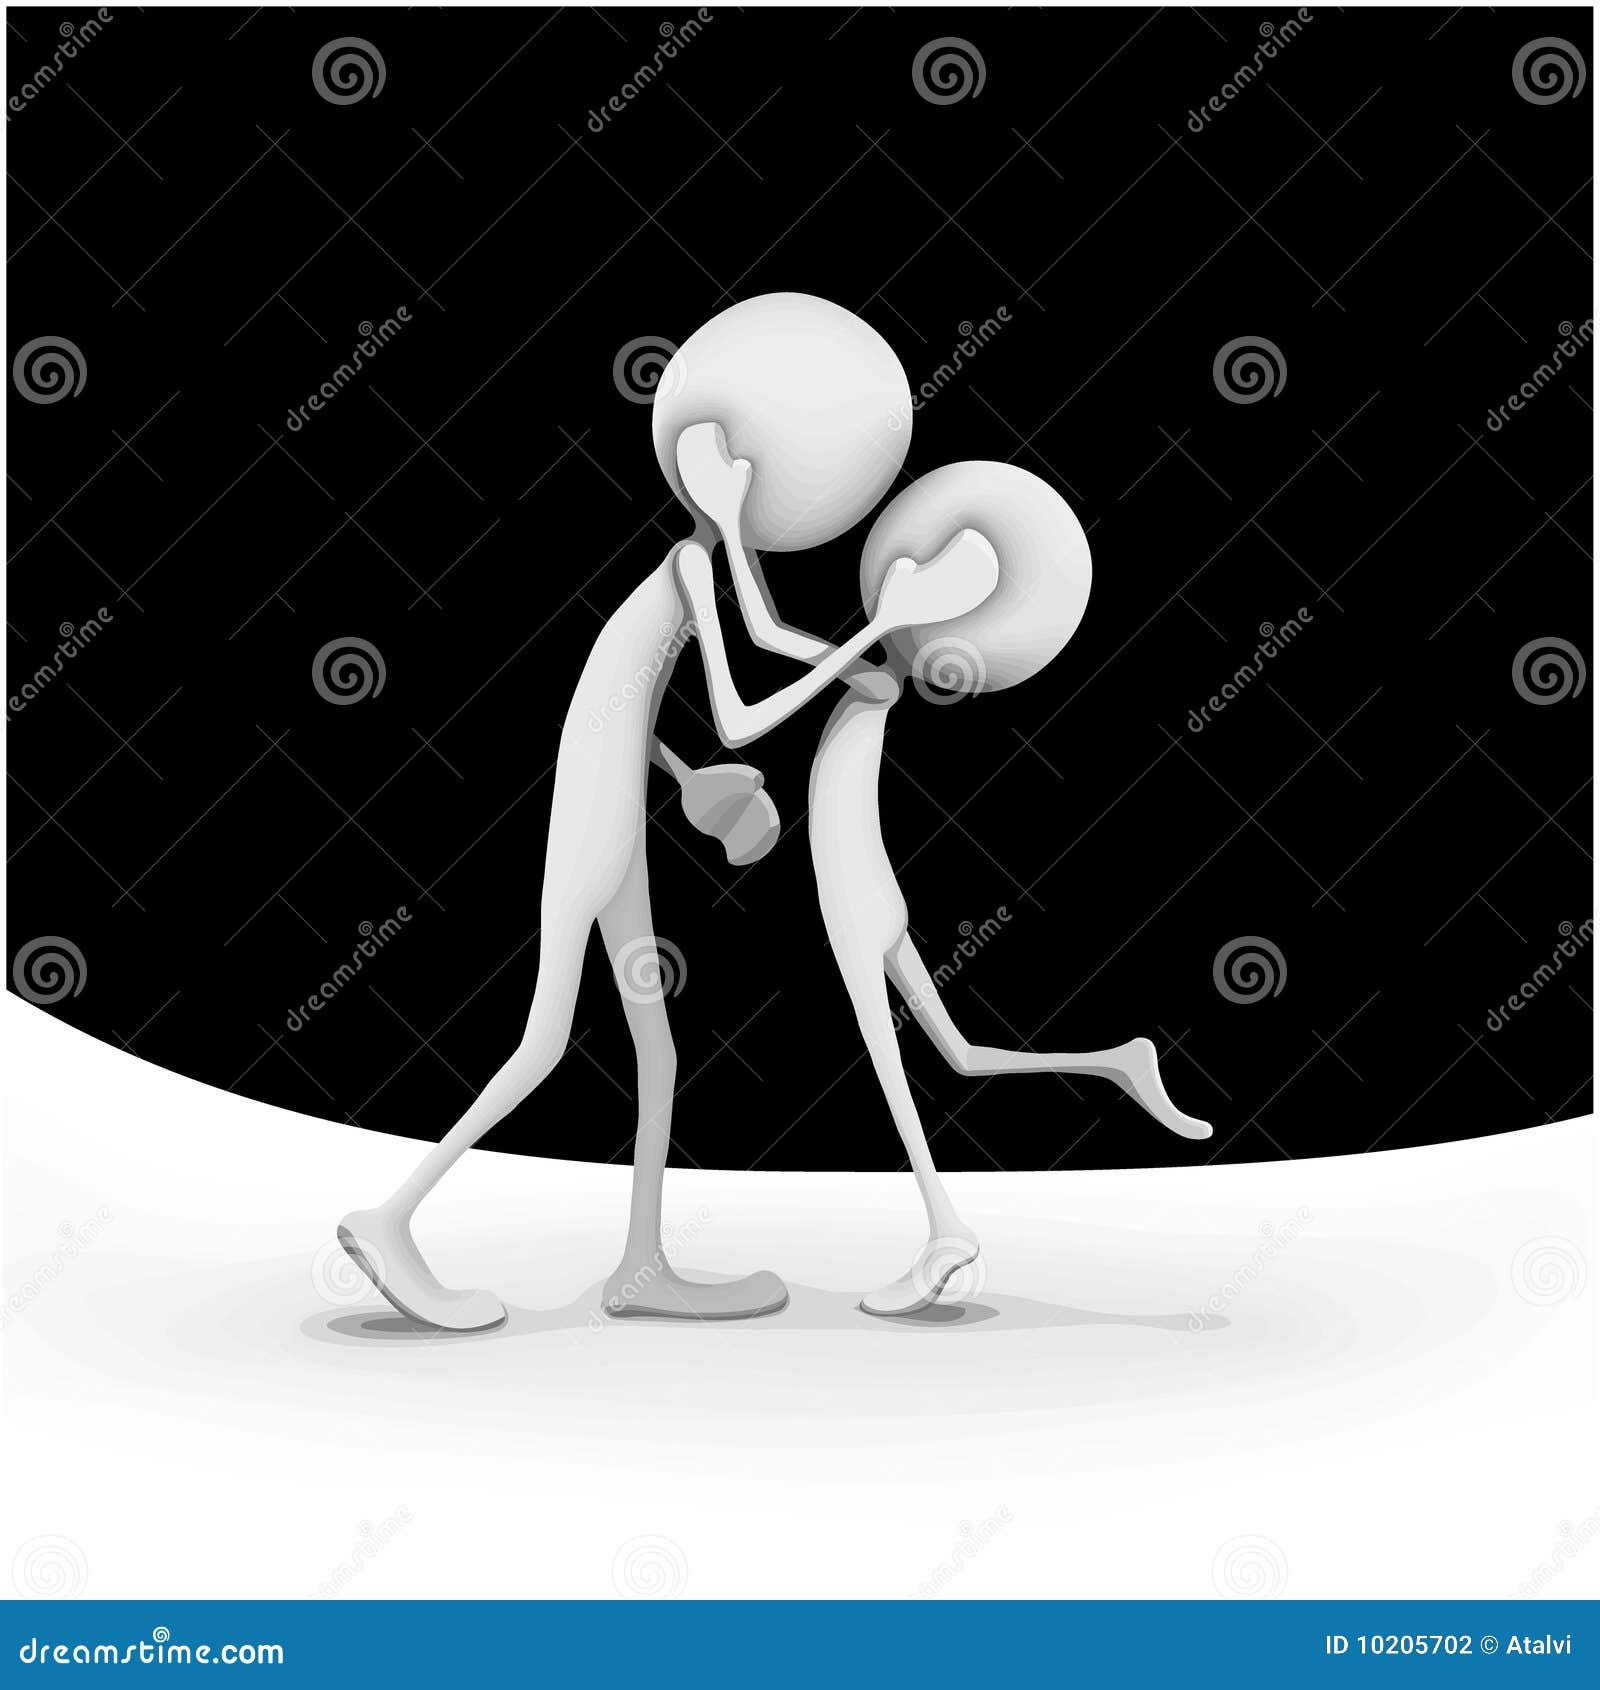 Cartoon Characters Kissing : Two cartoony characters kissing stock photography image